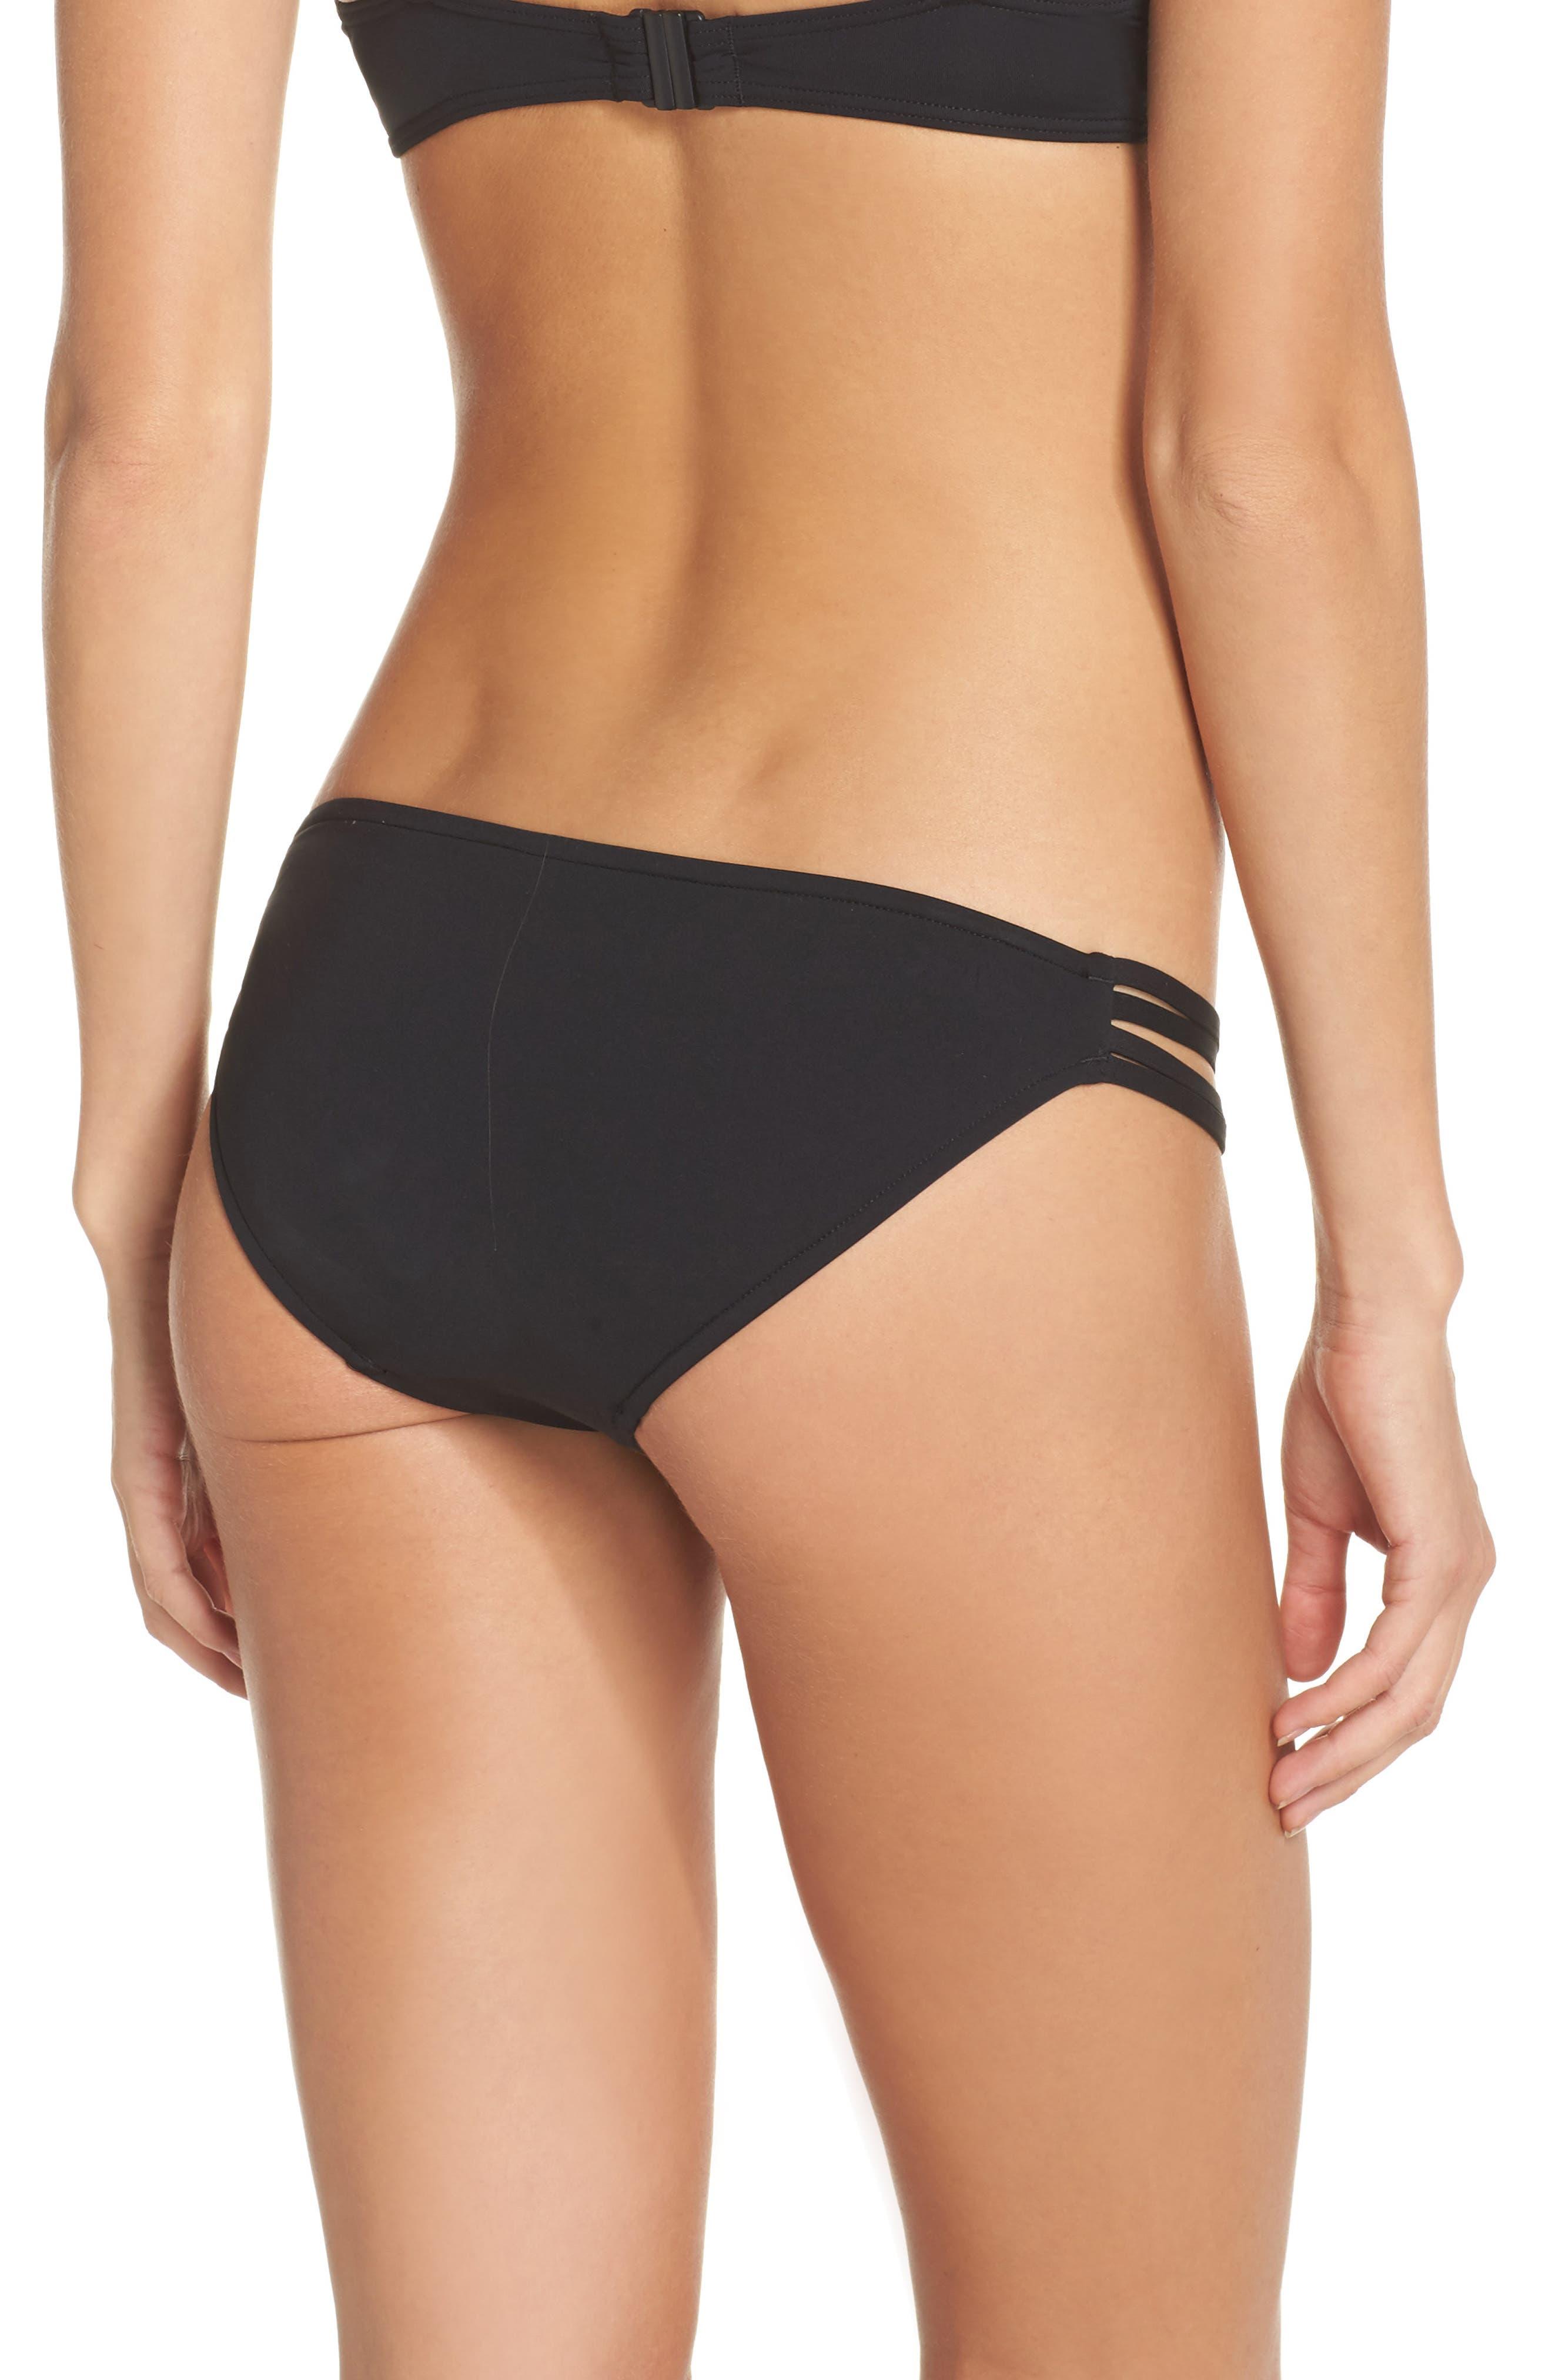 Cabana Embroidered Bikini Bottoms,                             Alternate thumbnail 2, color,                             Black